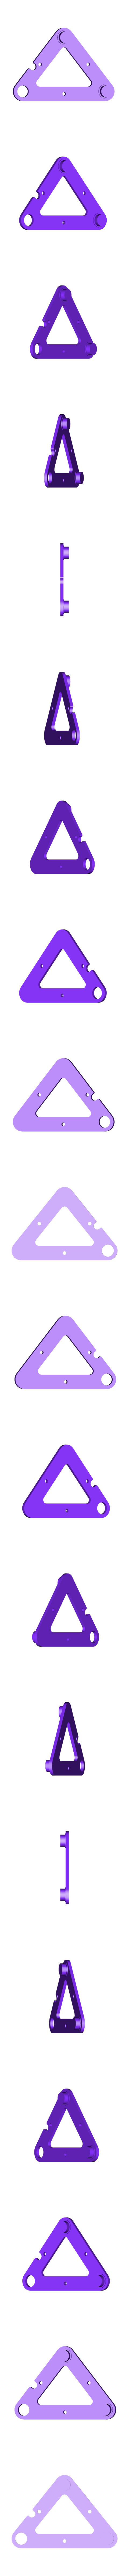 shaker-bearing-base.stl Download free STL file Crickit Lab Shaker • Template to 3D print, Adafruit